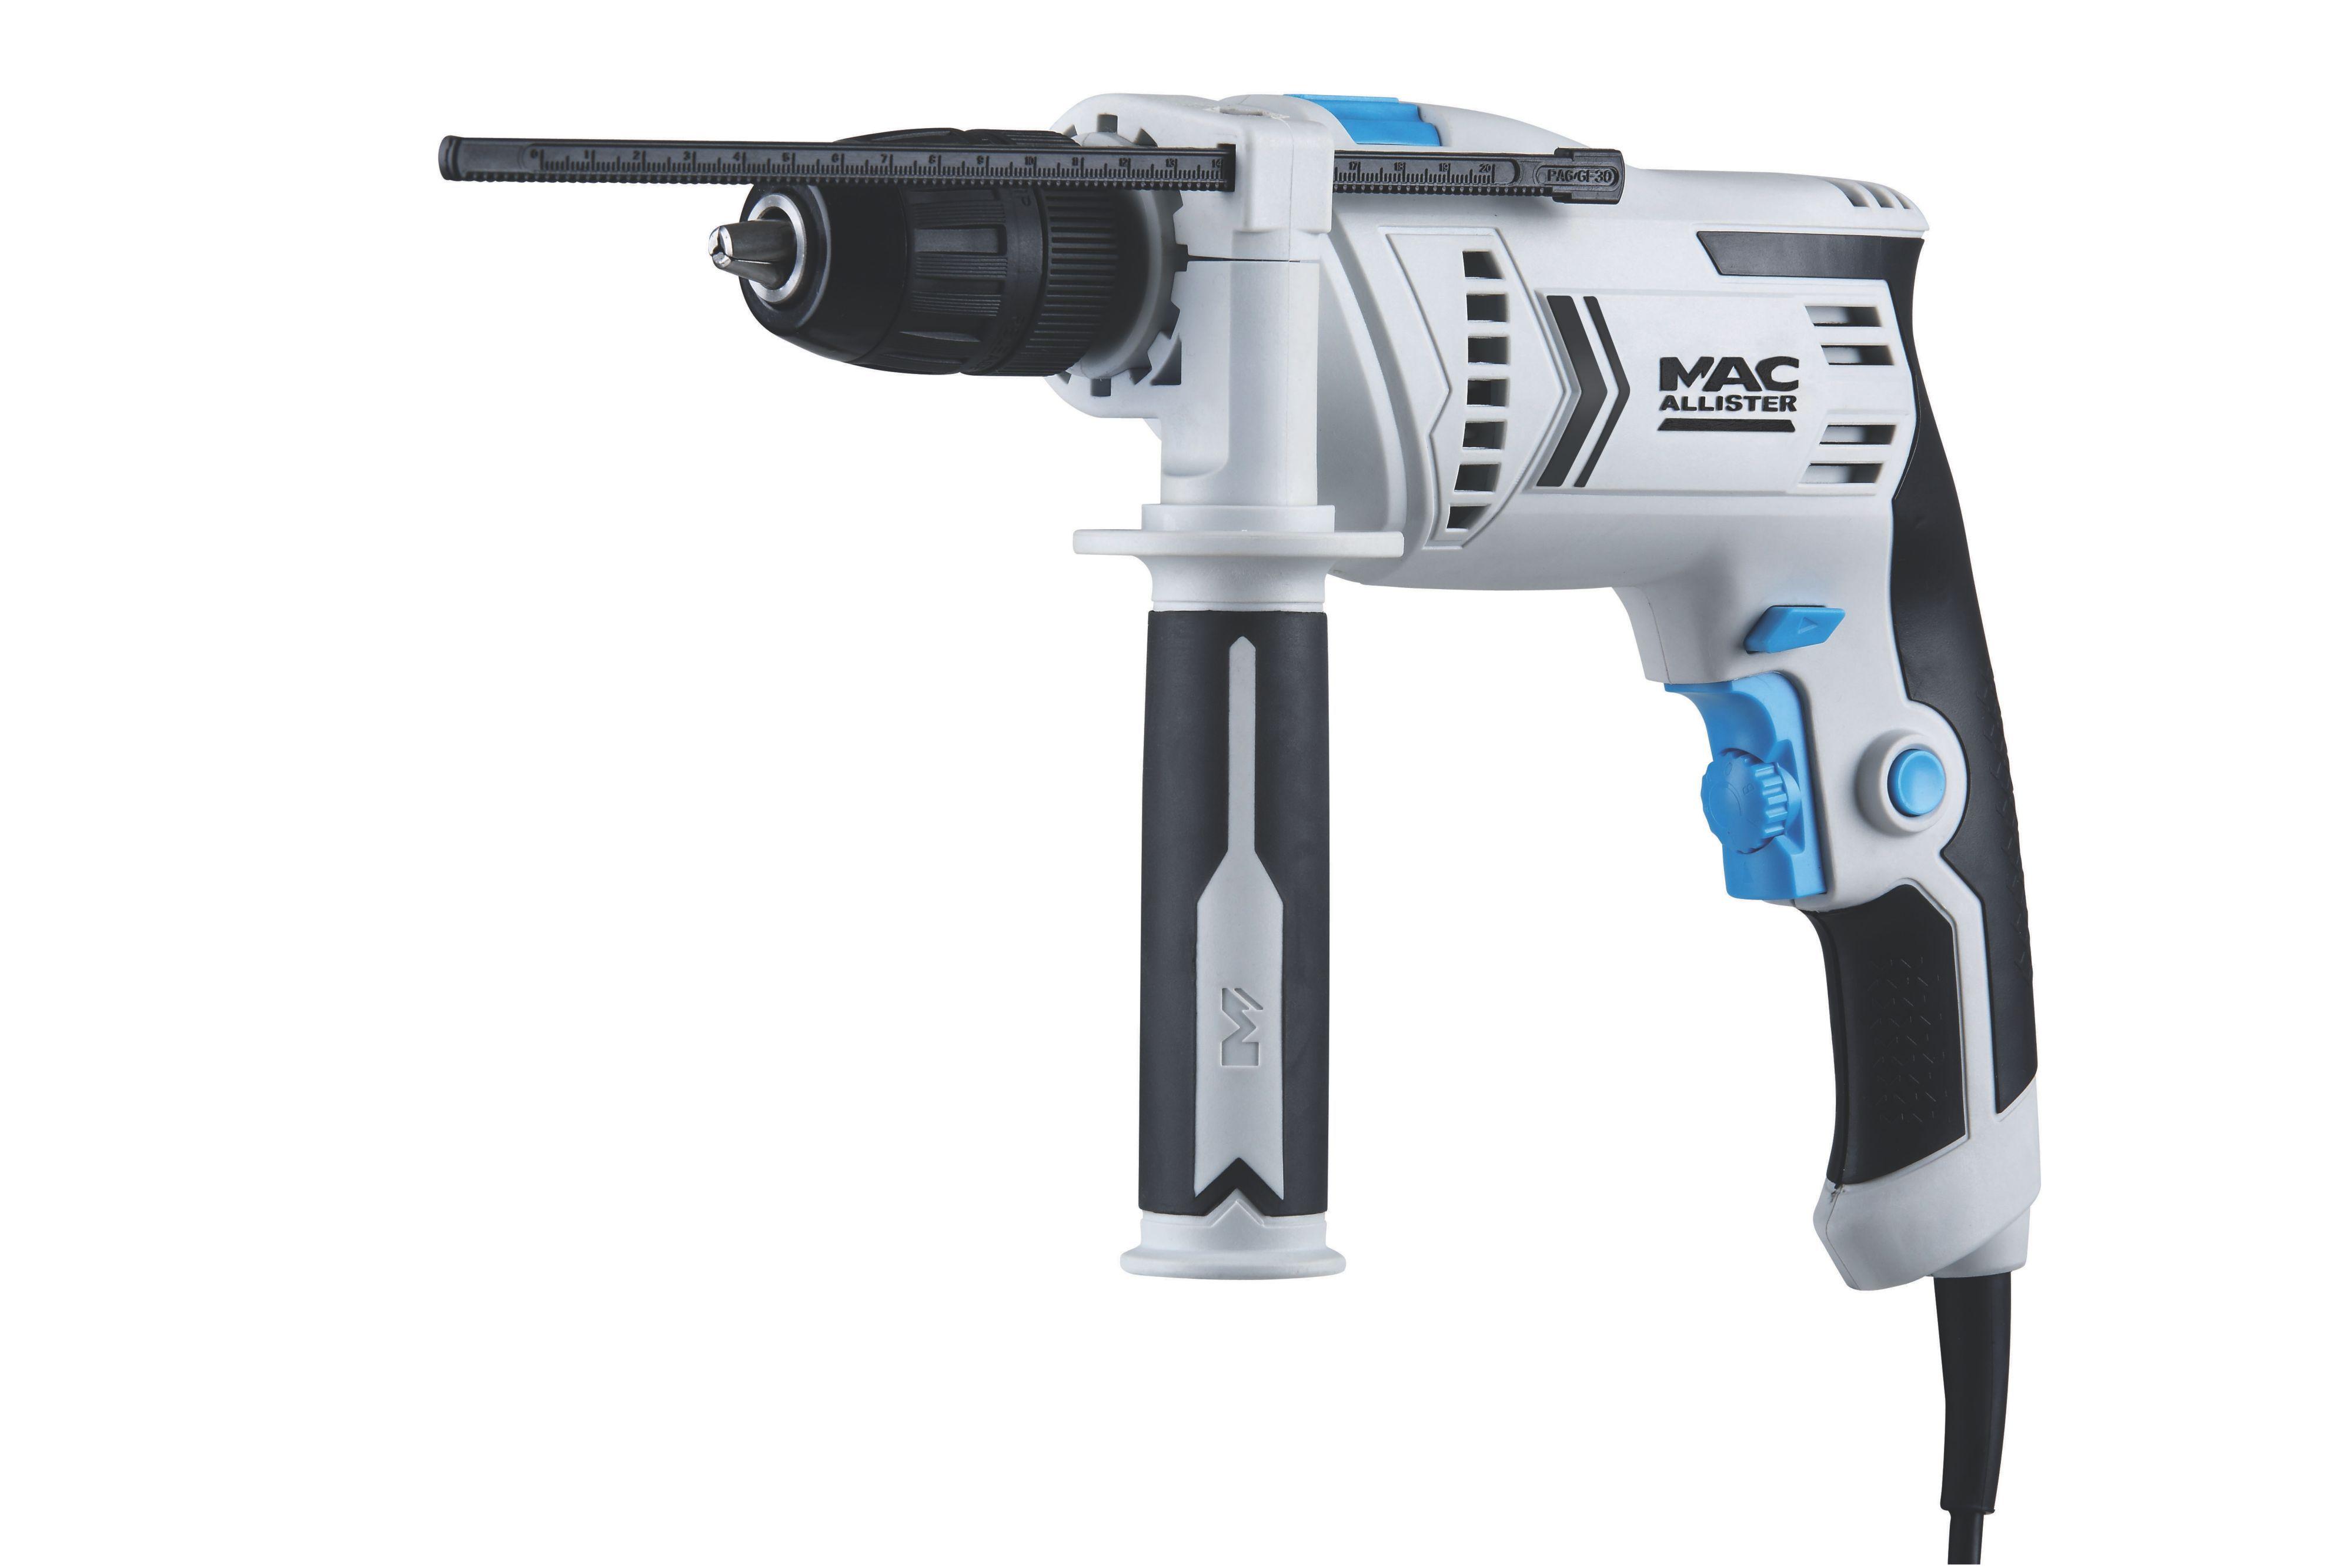 mac allister 600w corded hammer drill mshd600. Black Bedroom Furniture Sets. Home Design Ideas